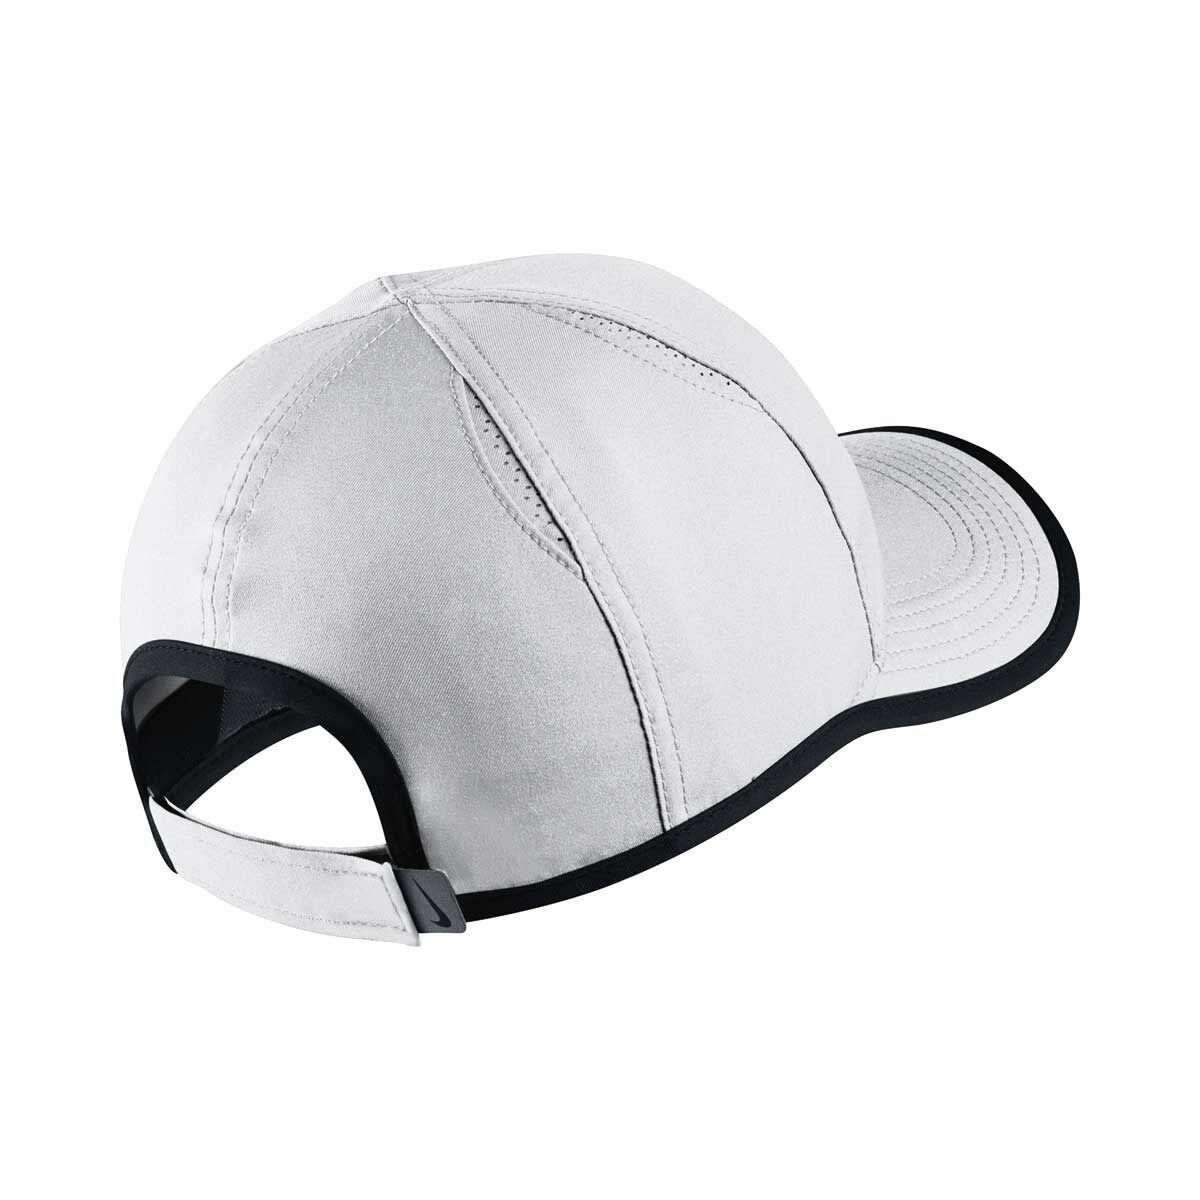 21aa0e1e ... best price nike girls featherlight cap white black osfa rebelhi res  cdeb4 a3577